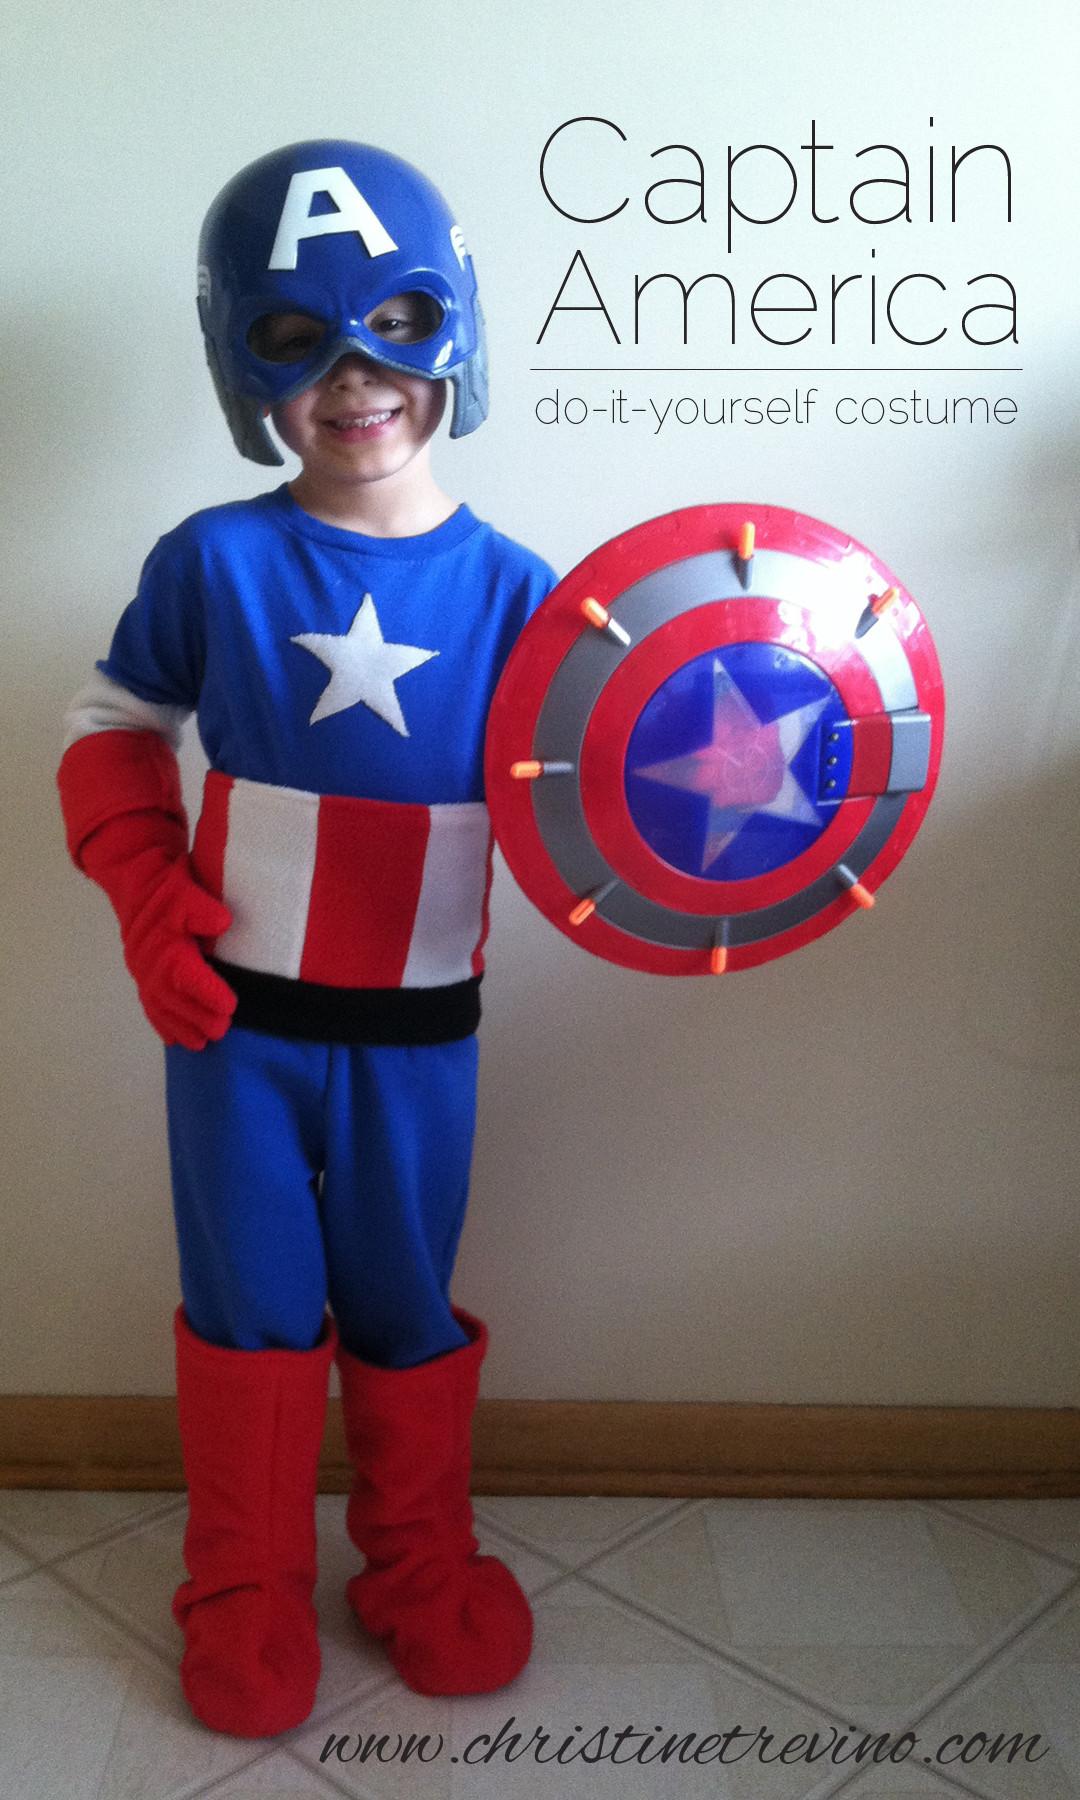 Best ideas about Captain America DIY Costume . Save or Pin Captain America Costume Christine Trevino Now.